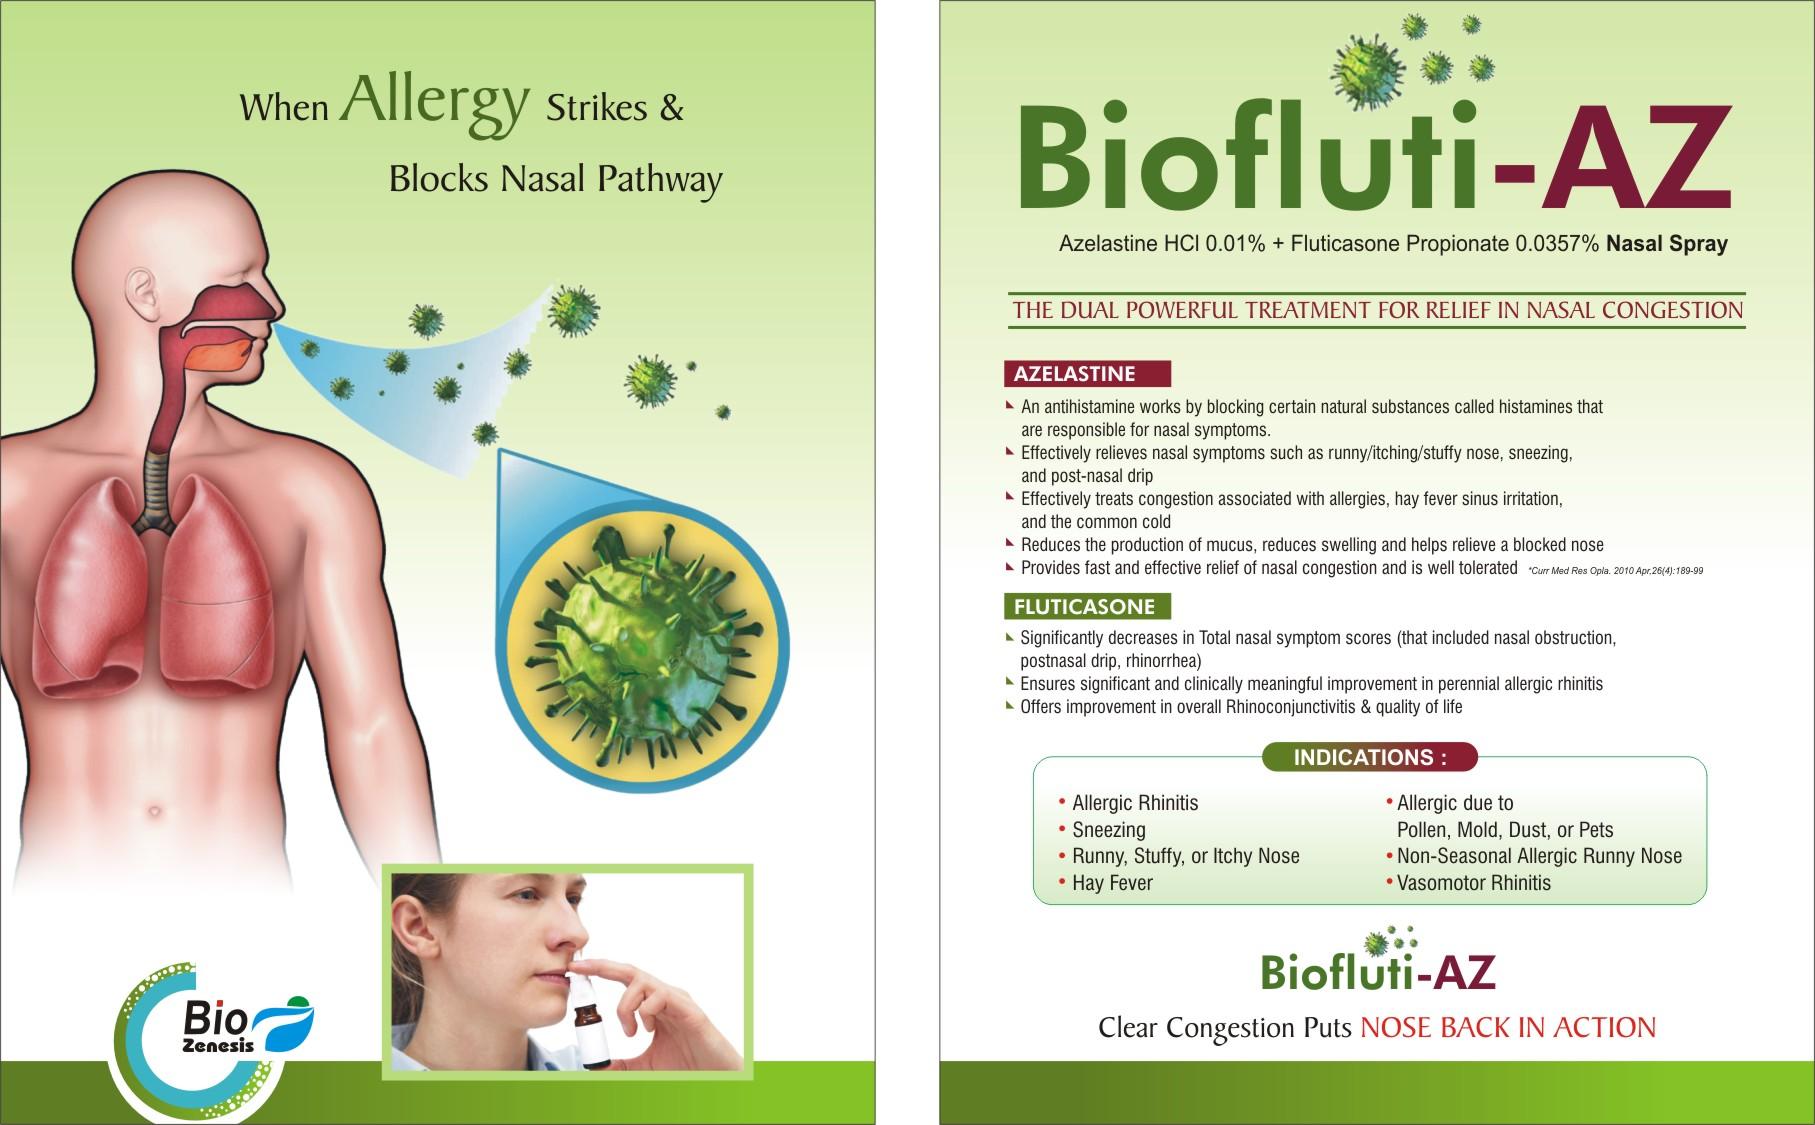 Biofluti-AZ